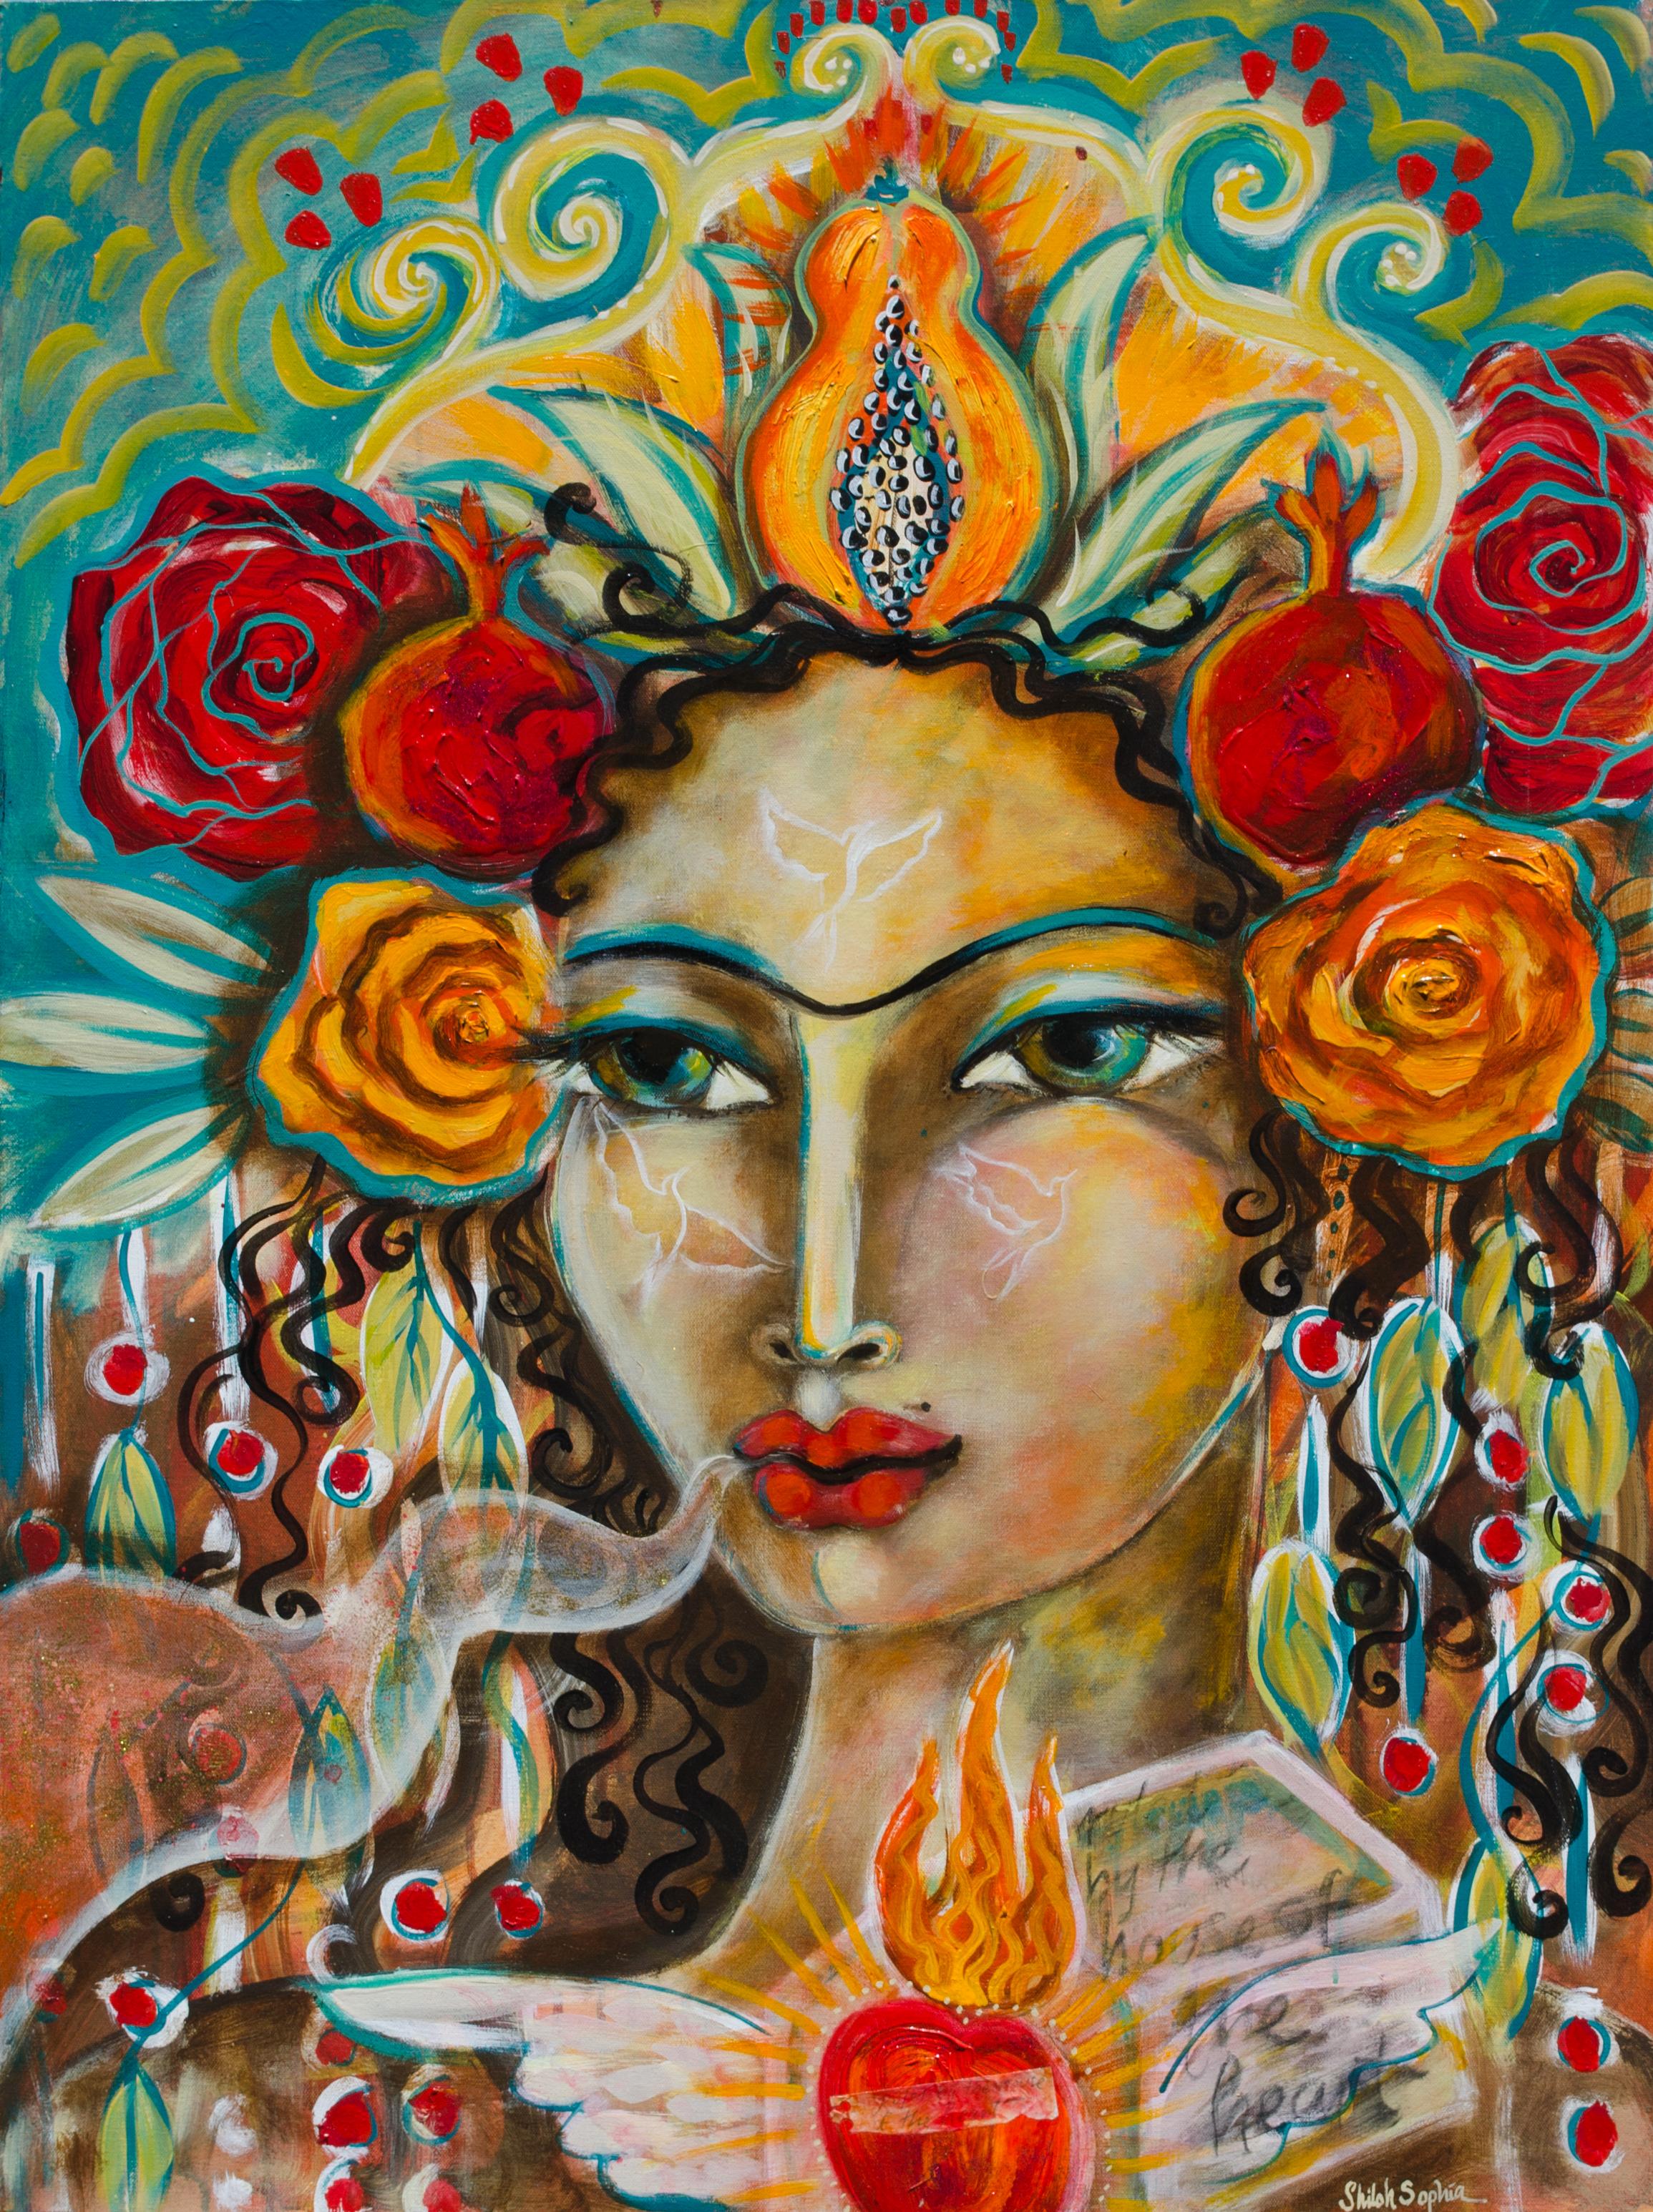 Artist: Shiloh Sophia